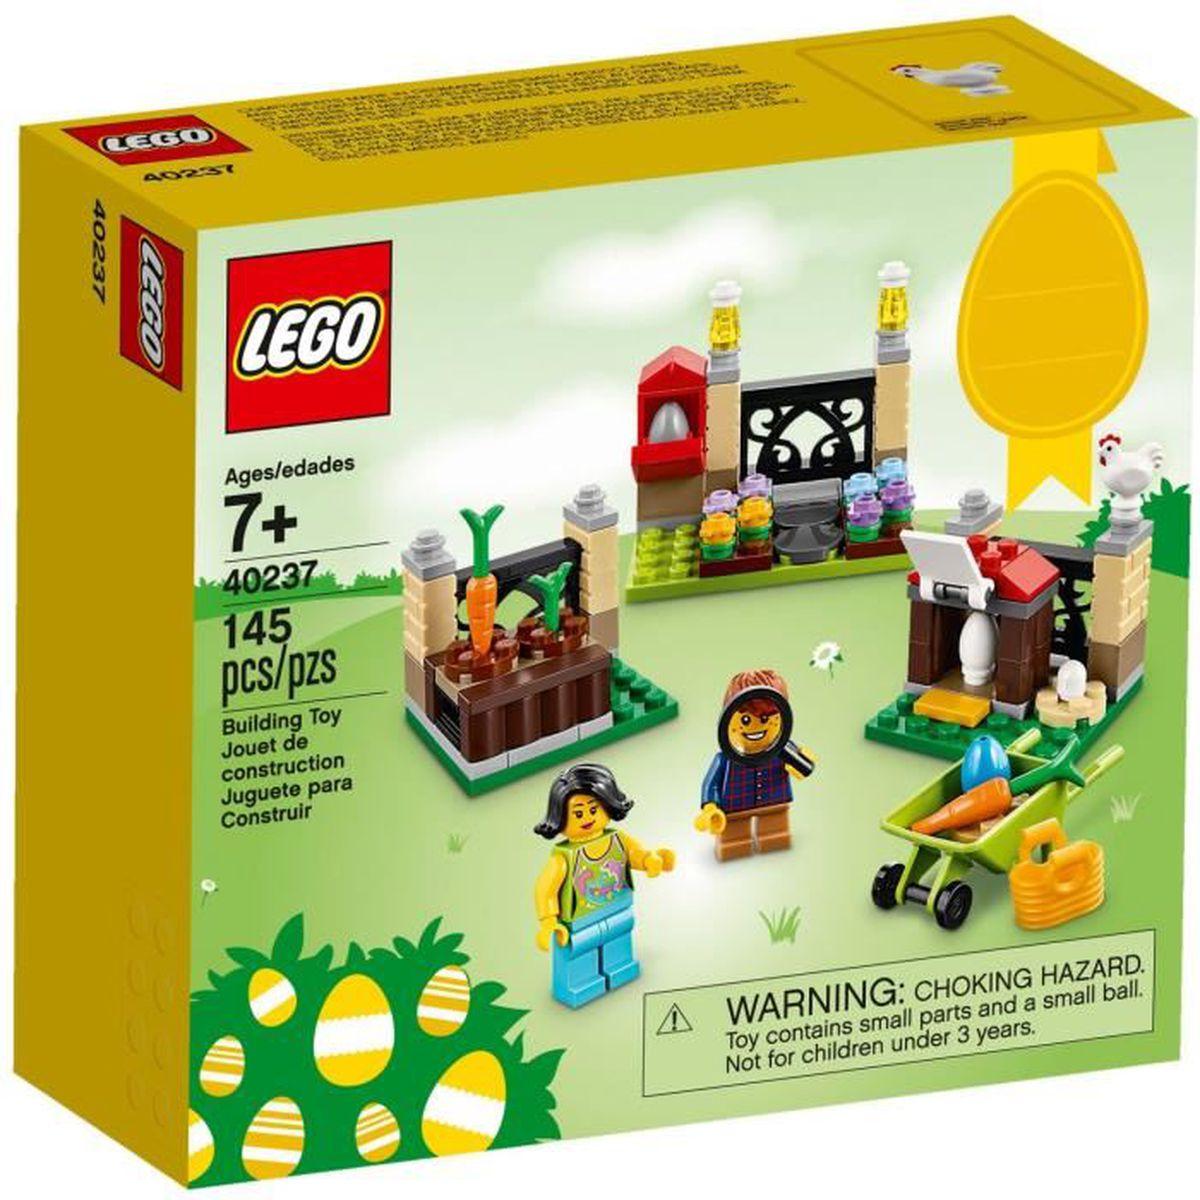 PROMO Pâques Set Lego Gingerbread Man maison 5005156